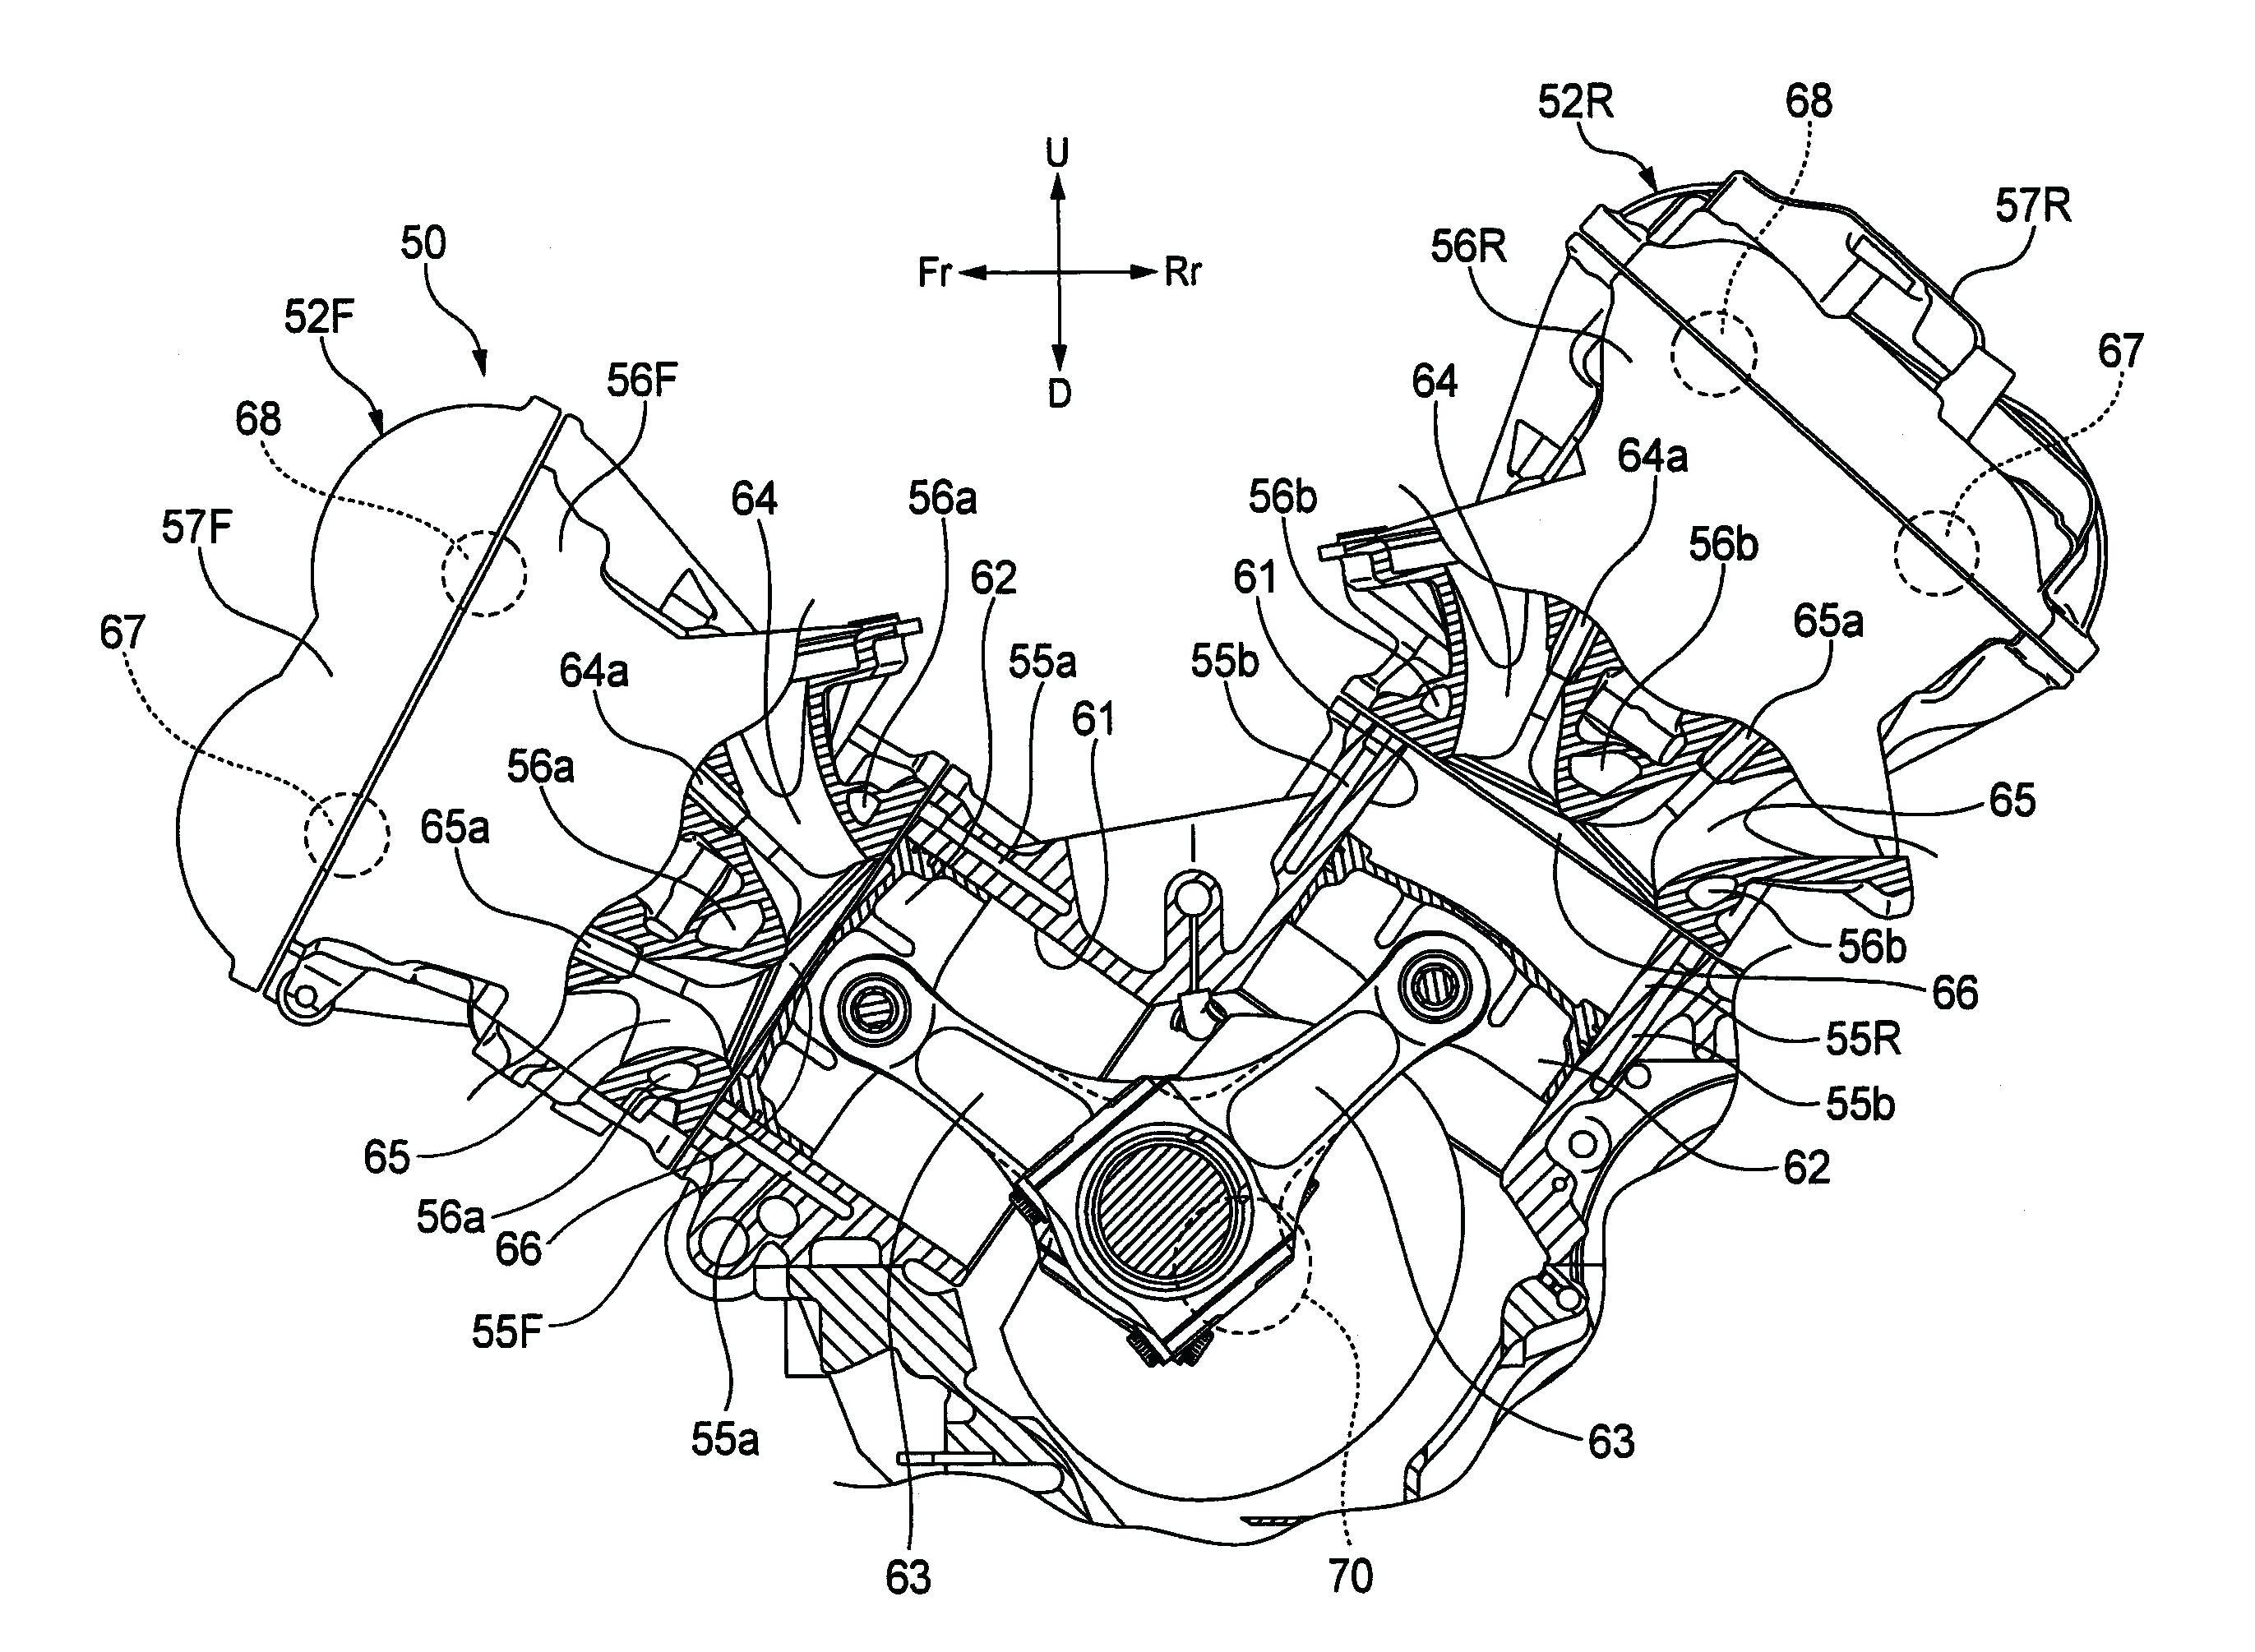 Motorcycle Engine Parts Diagram 50cc Mini Chopper Custom Wiring Kawasaki Fs481v Manual Diagrams Of